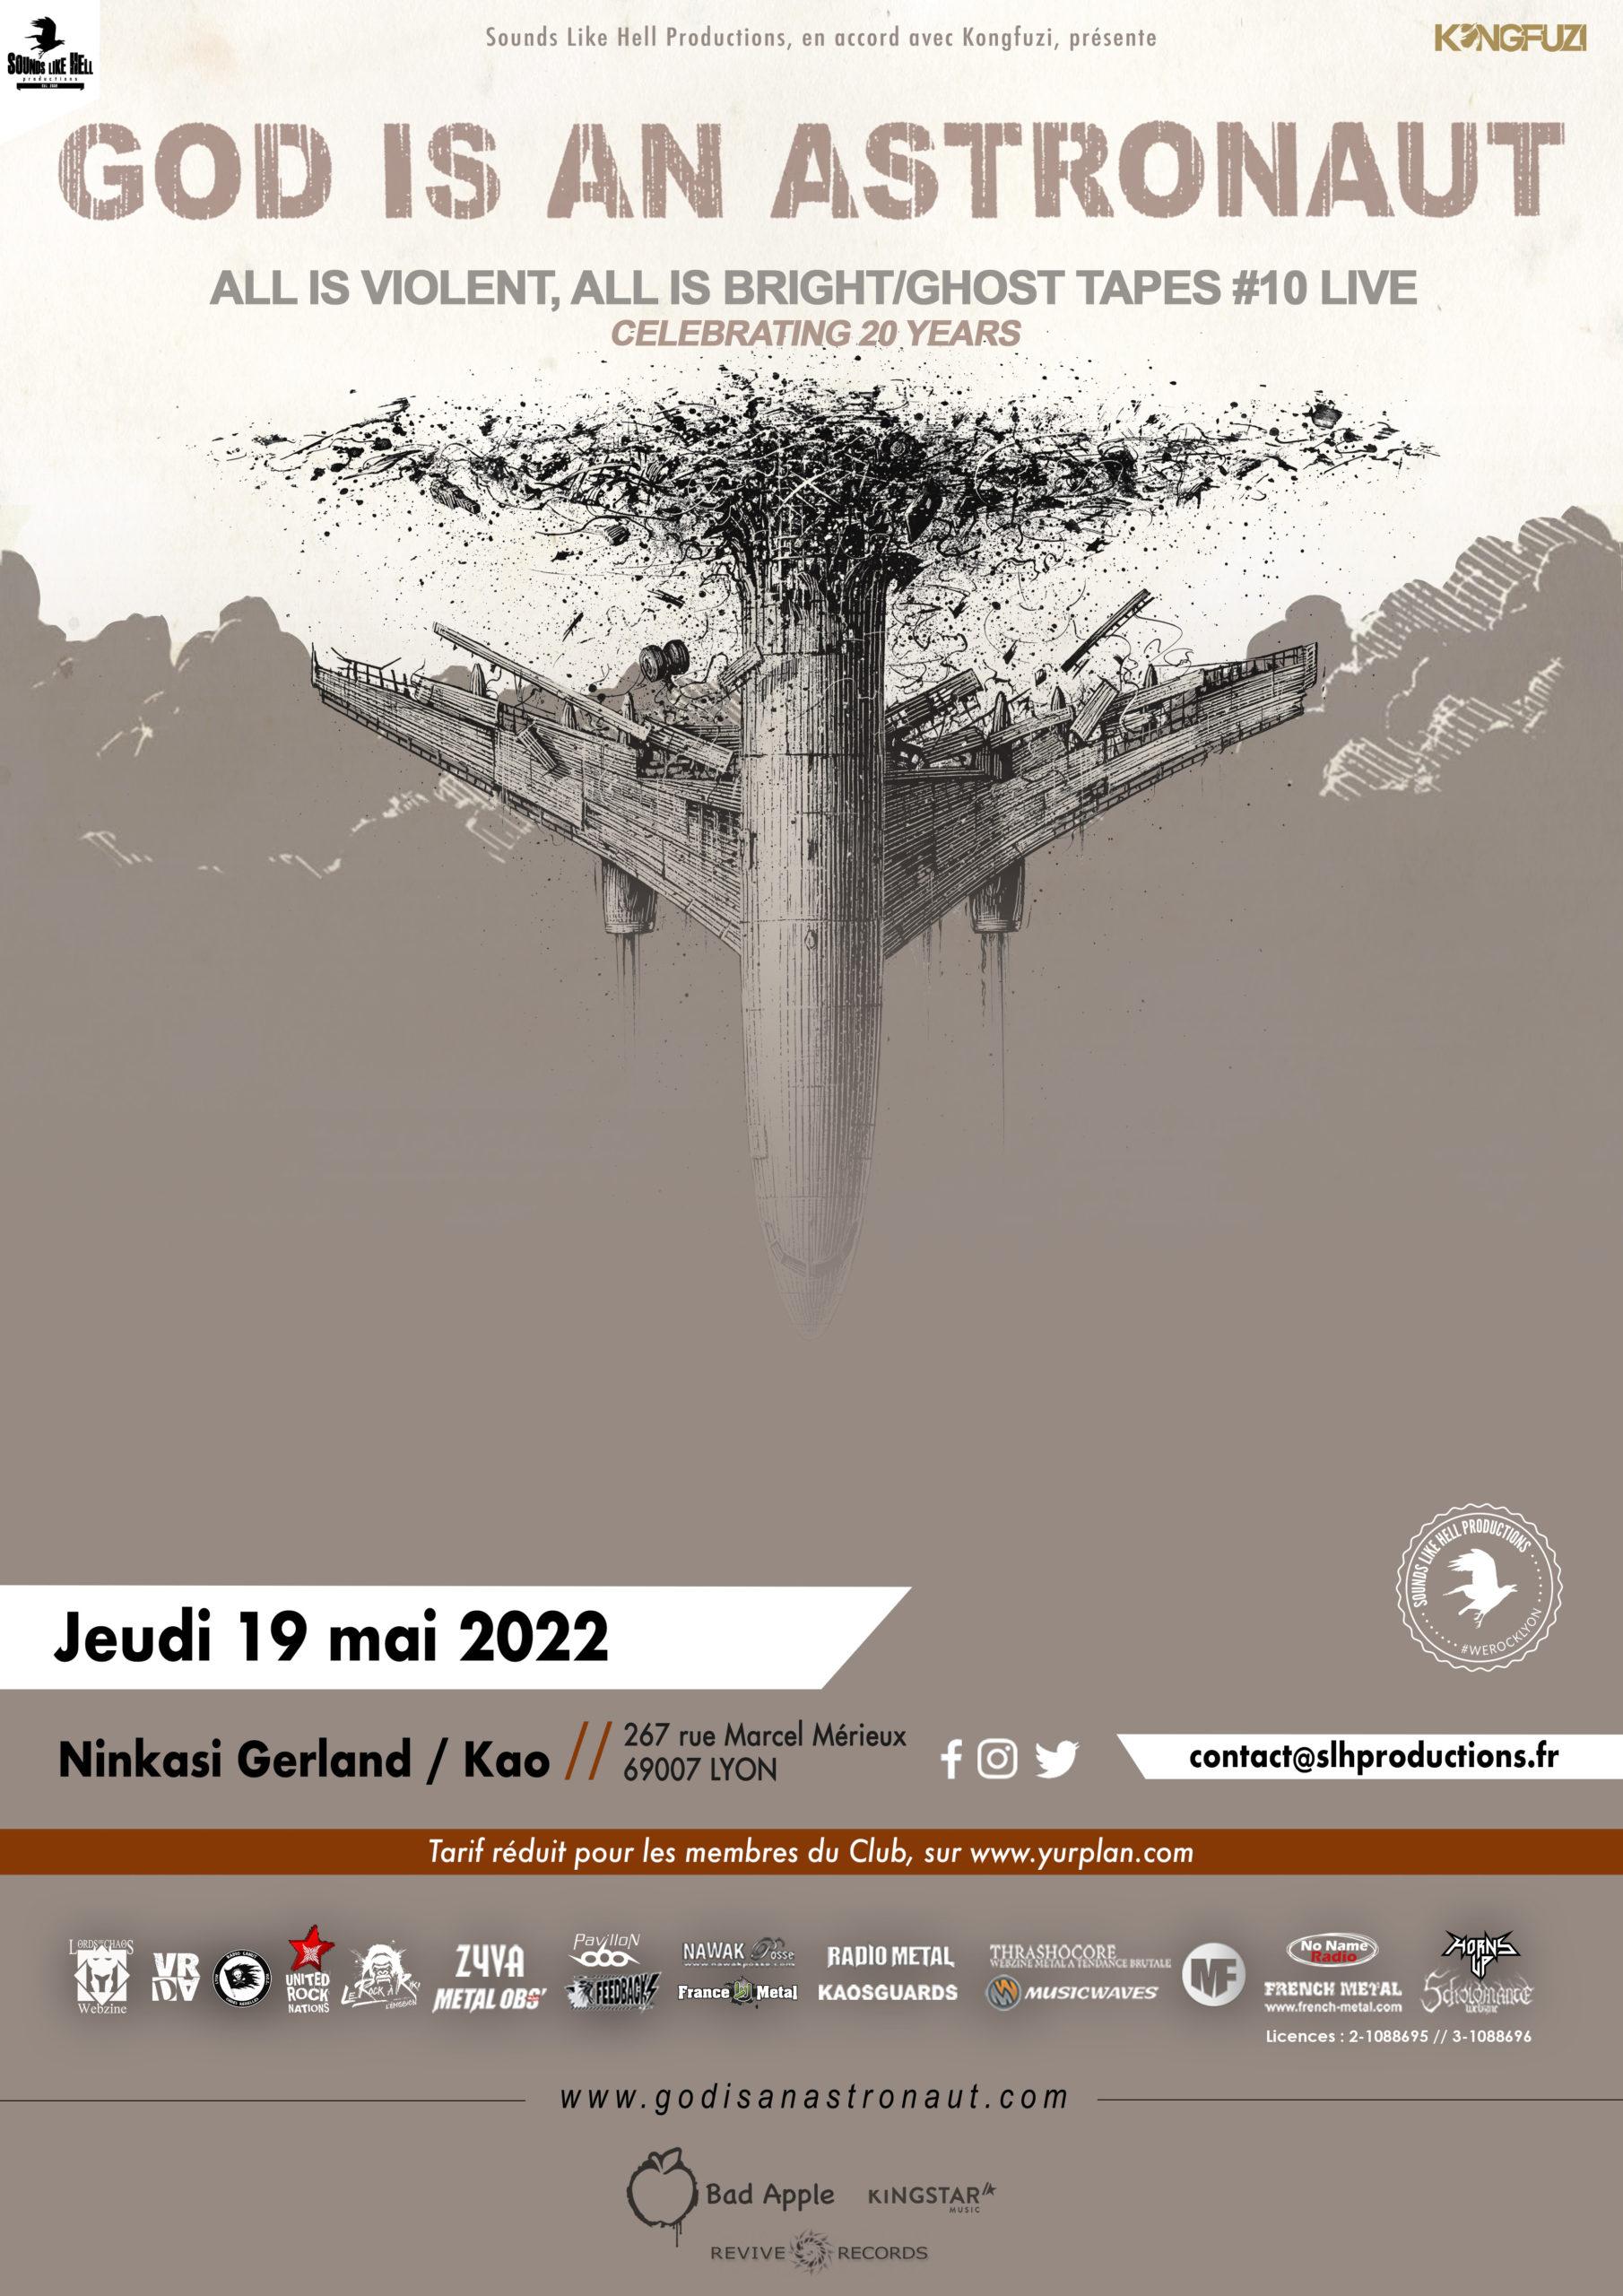 god is an astronaut - concert lyon 2022